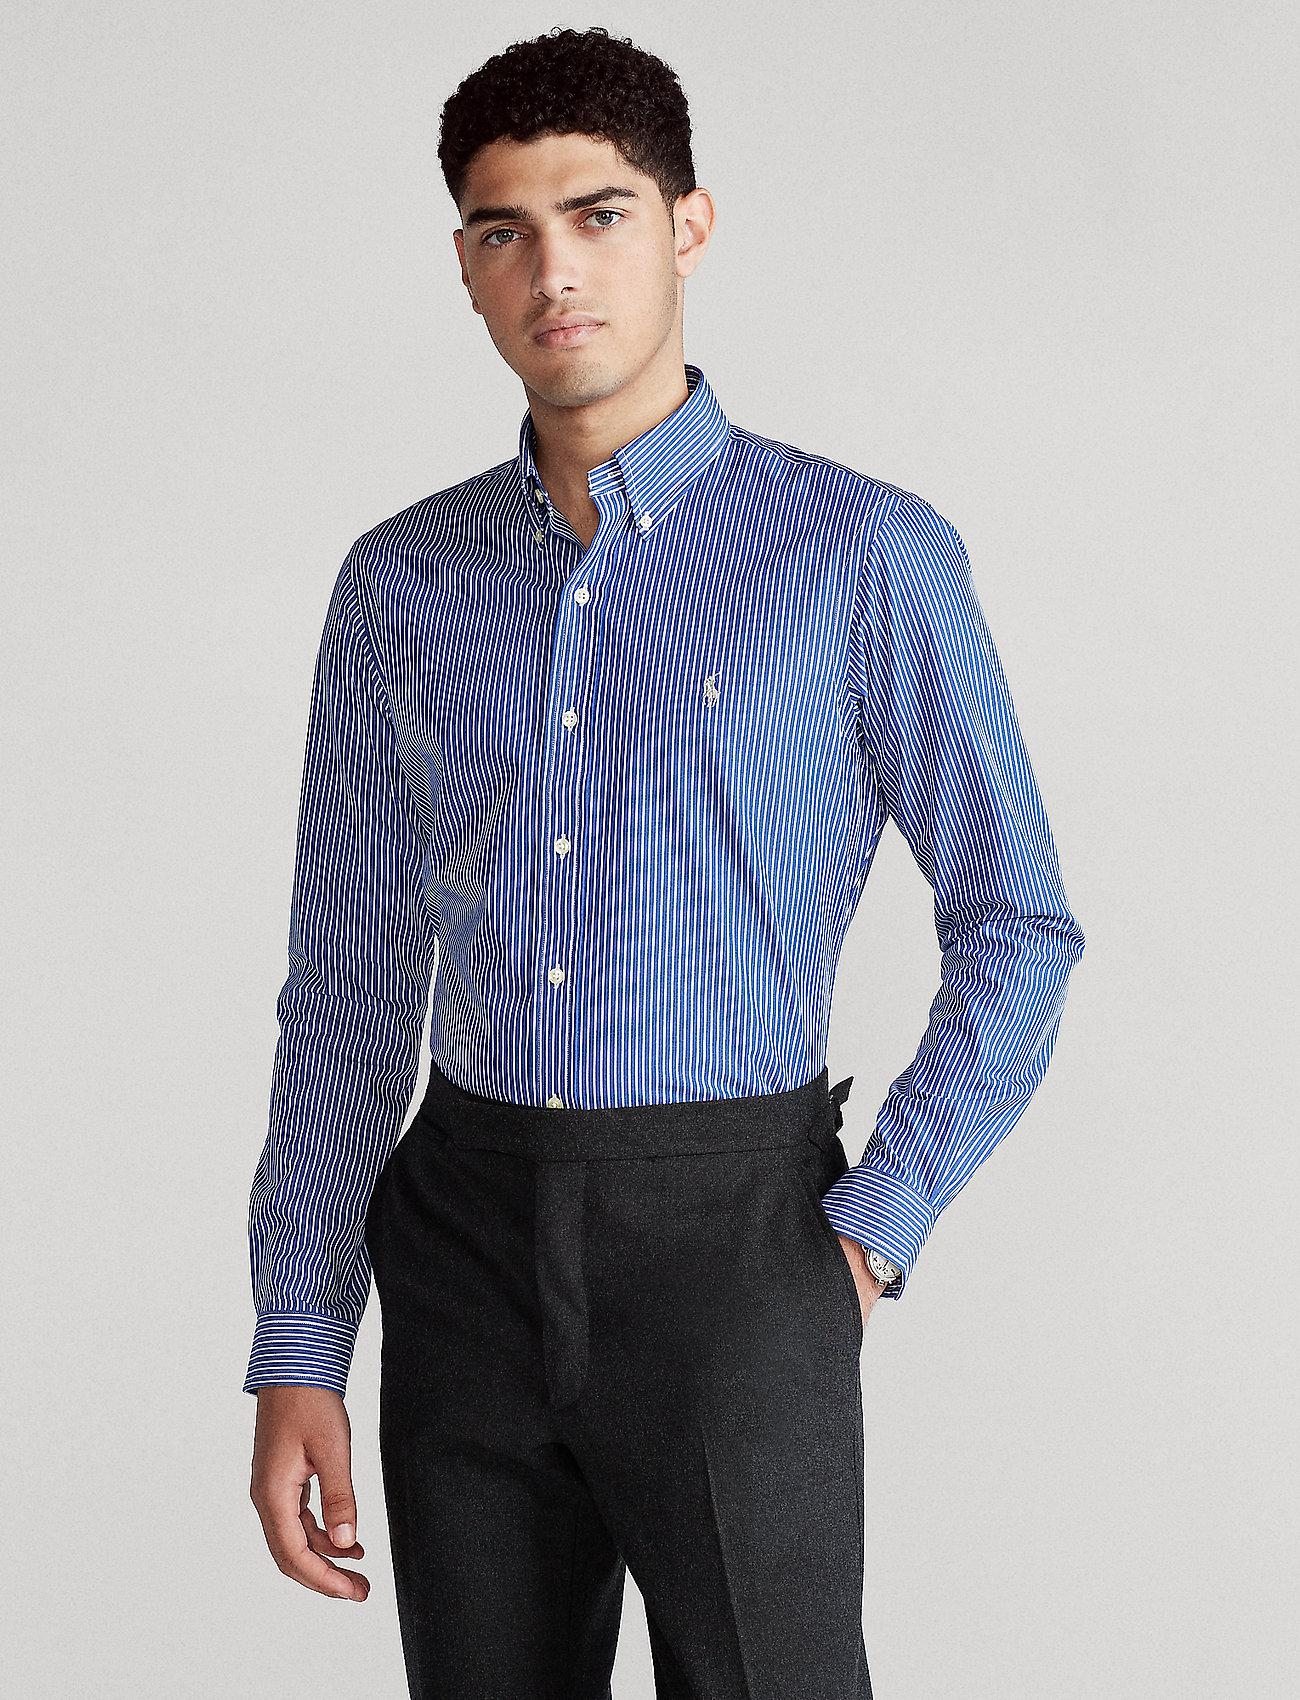 Polo Ralph Lauren - 4D STRETCH POPLIN-SLESTPPCS - business shirts - 4885a blue/white - 0